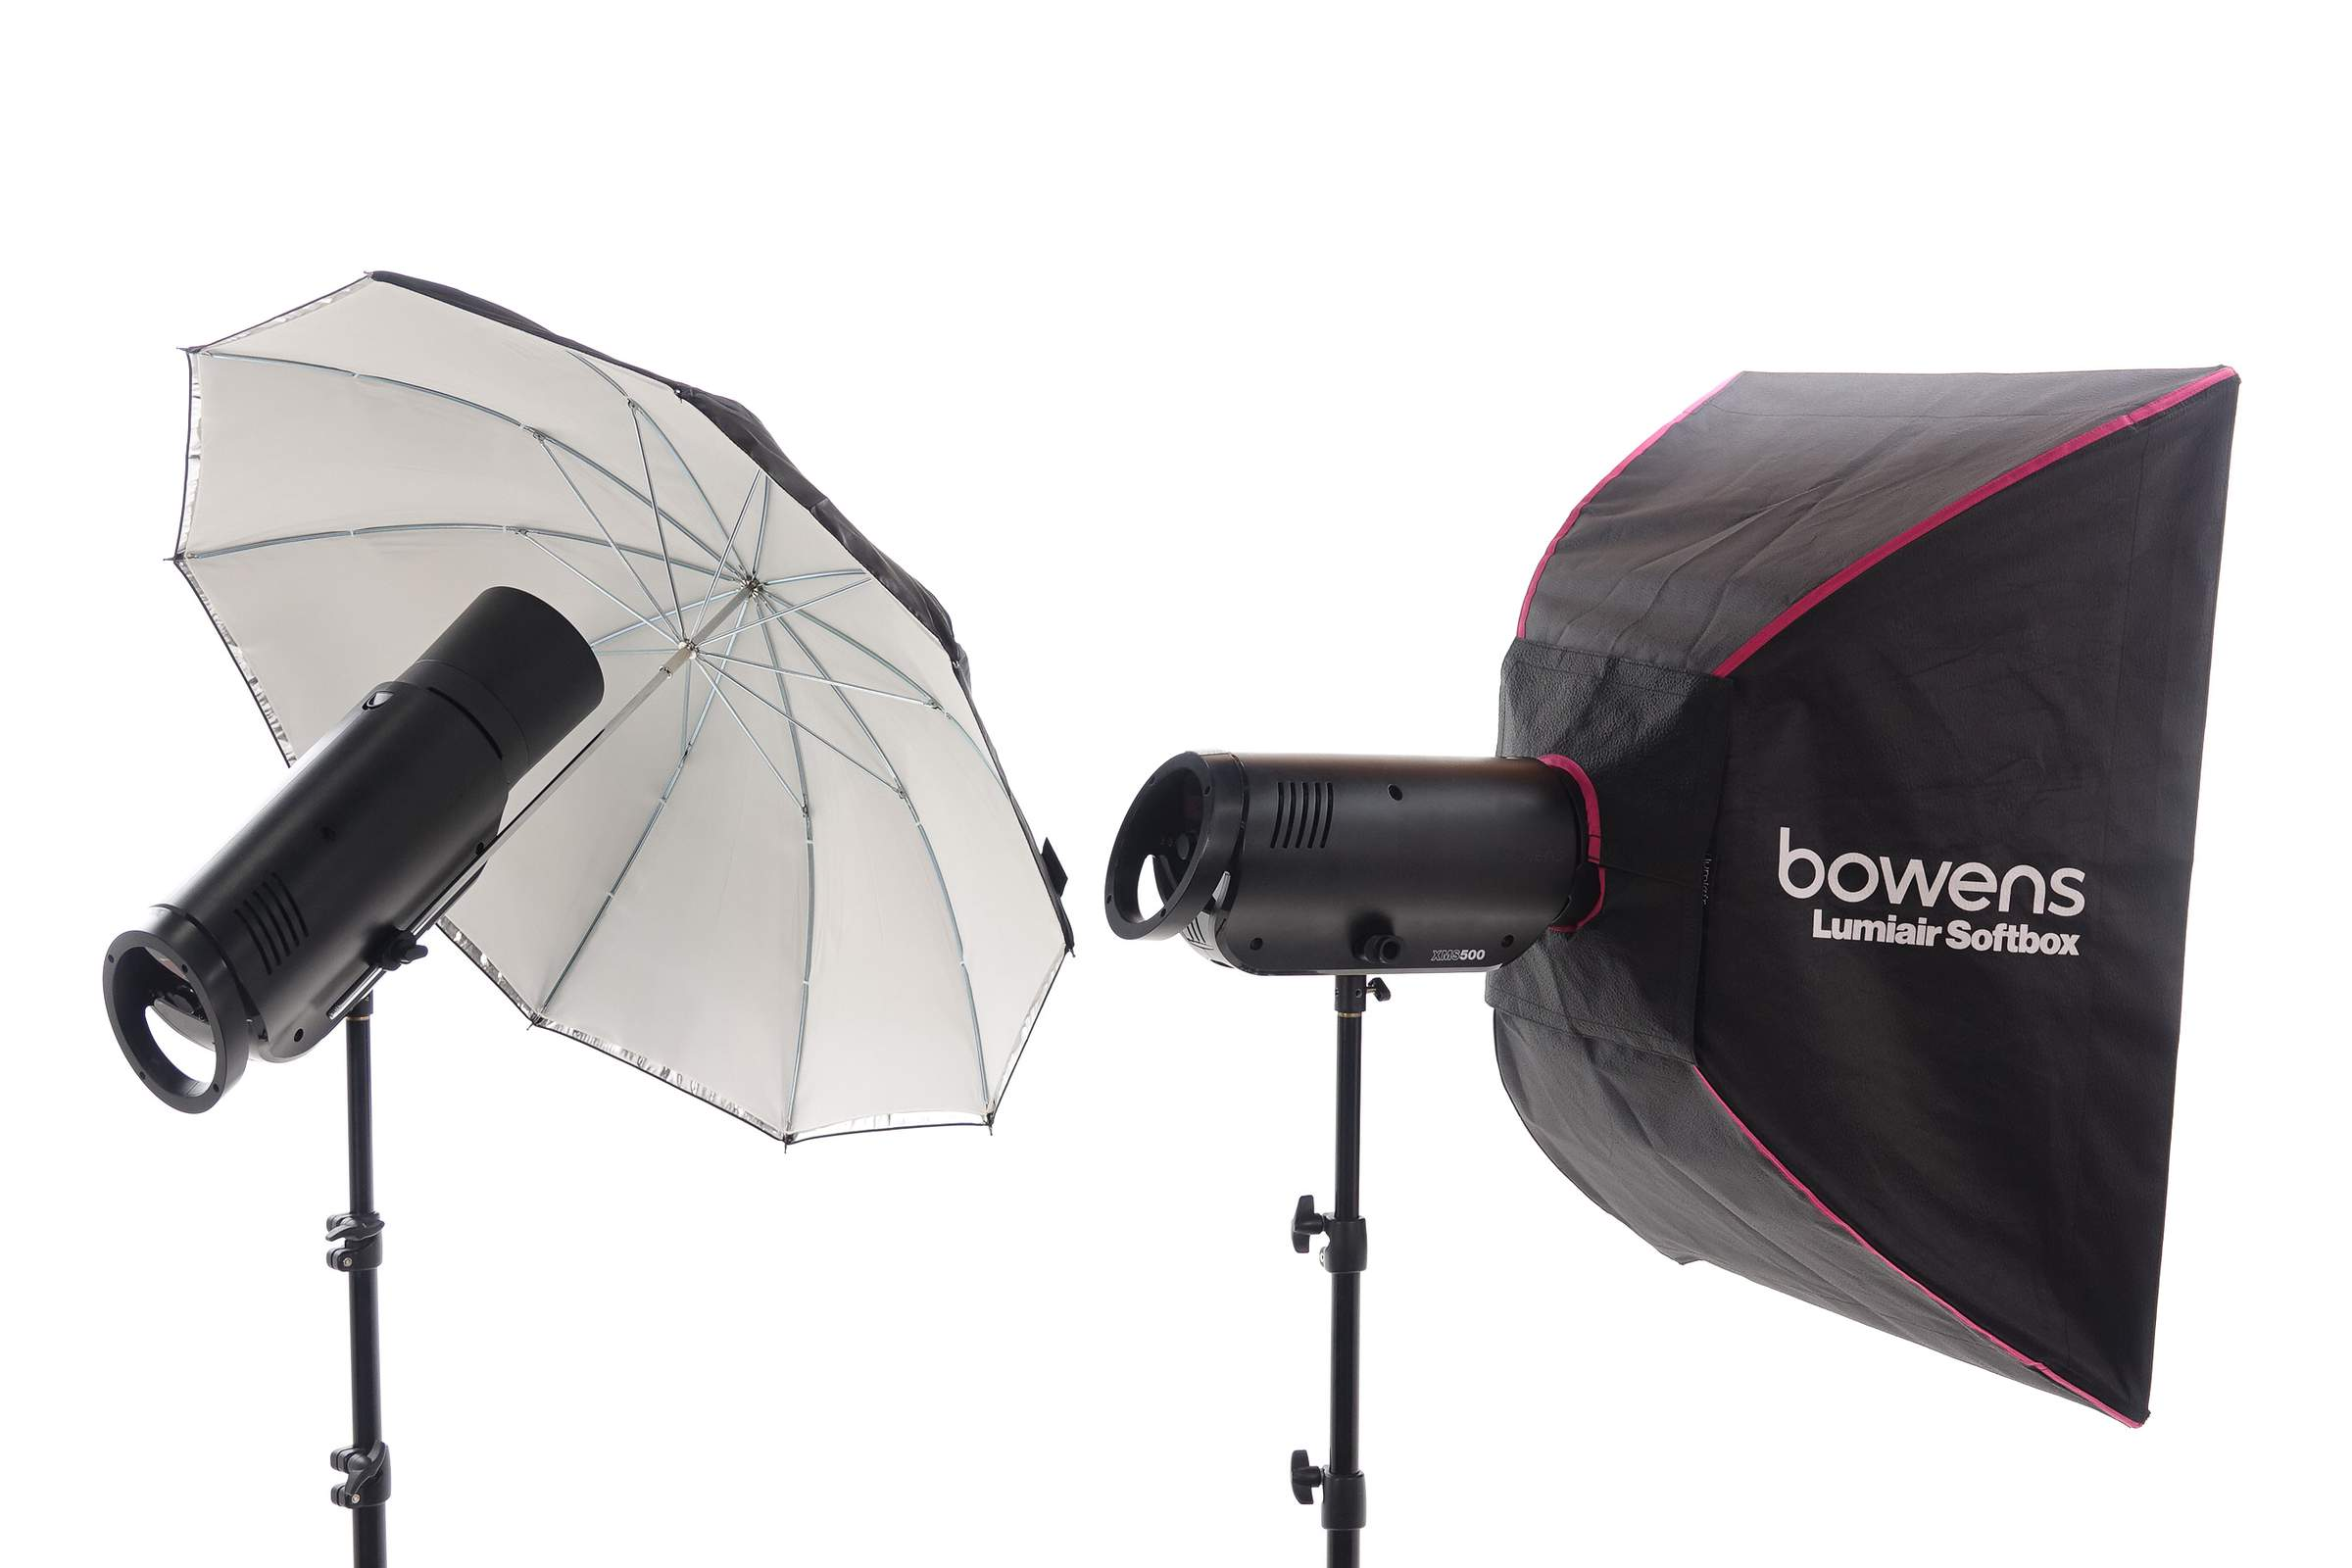 Bowens XMS 500 Kit